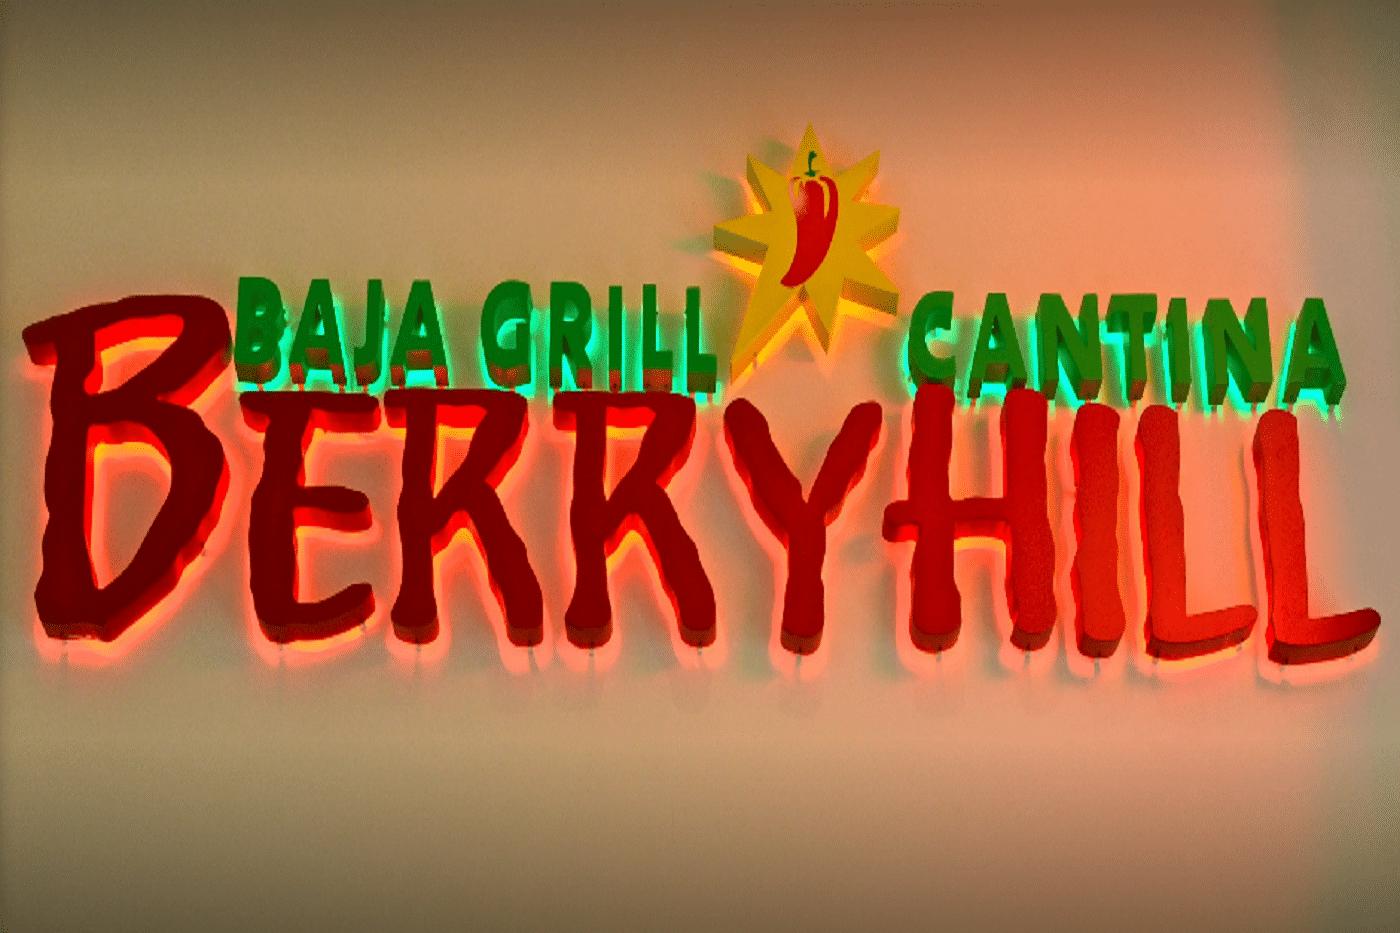 Berryhill Baja Grill,731 Memorial City Way, Houston, TX 77024 Refilling Violation